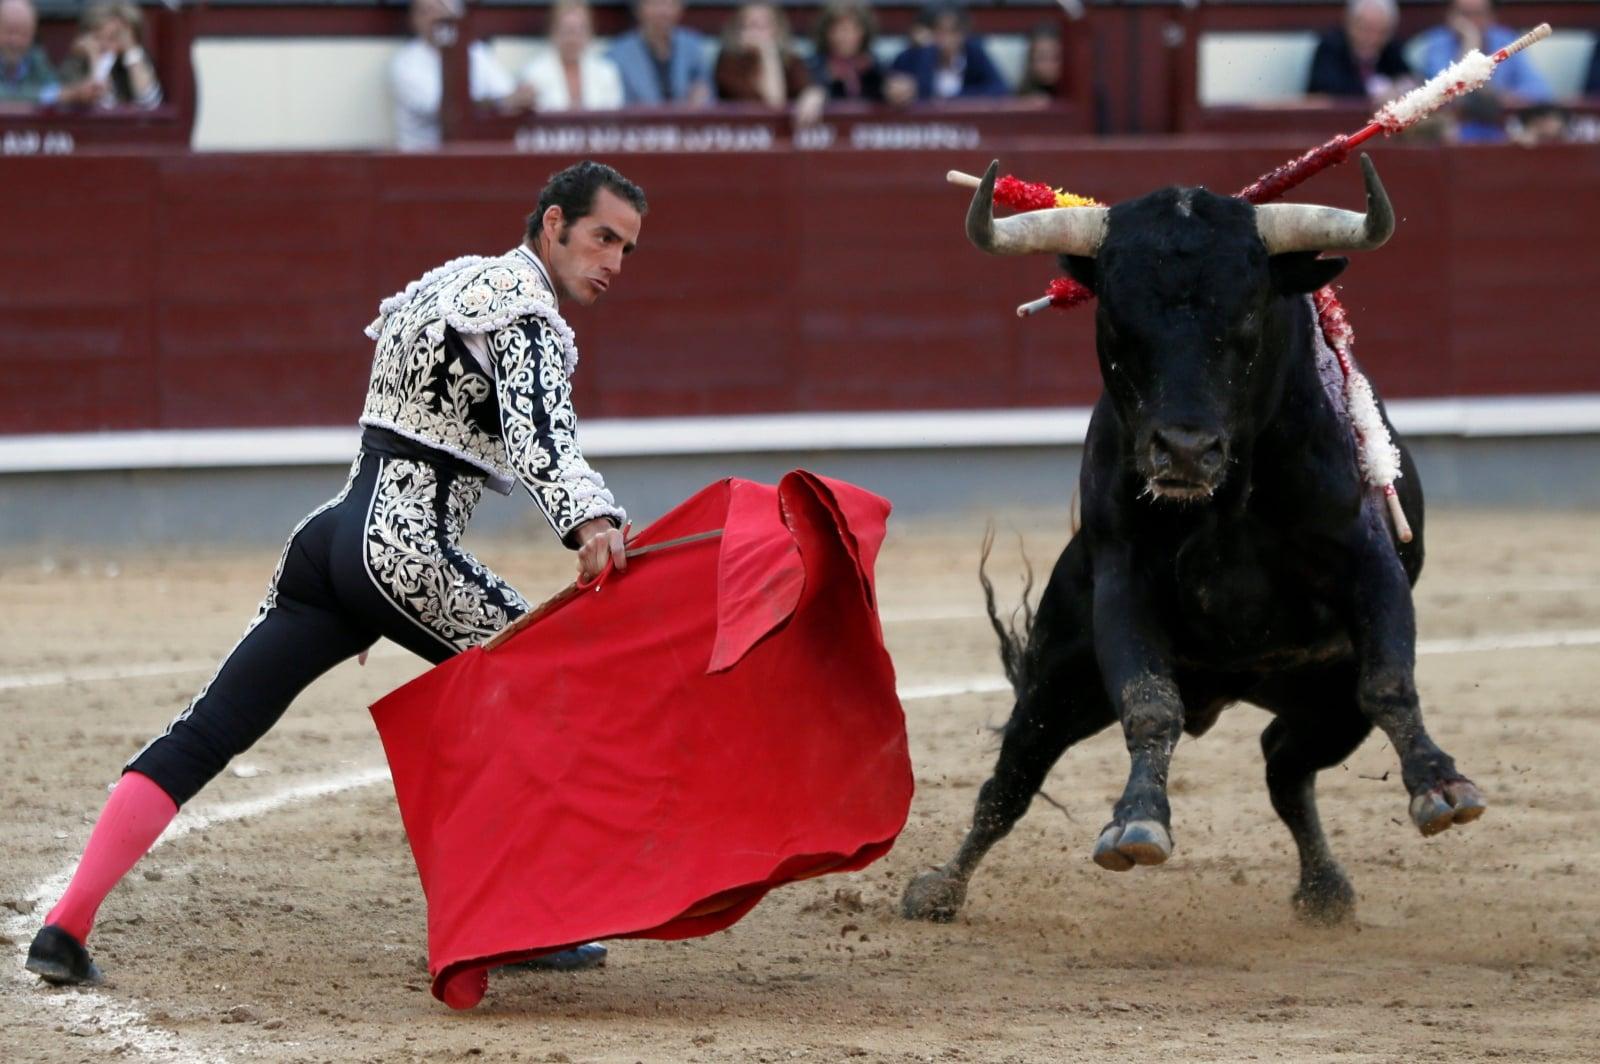 Corrida w Hiszpanii fot. EPA/FERNANDO ALVARADO